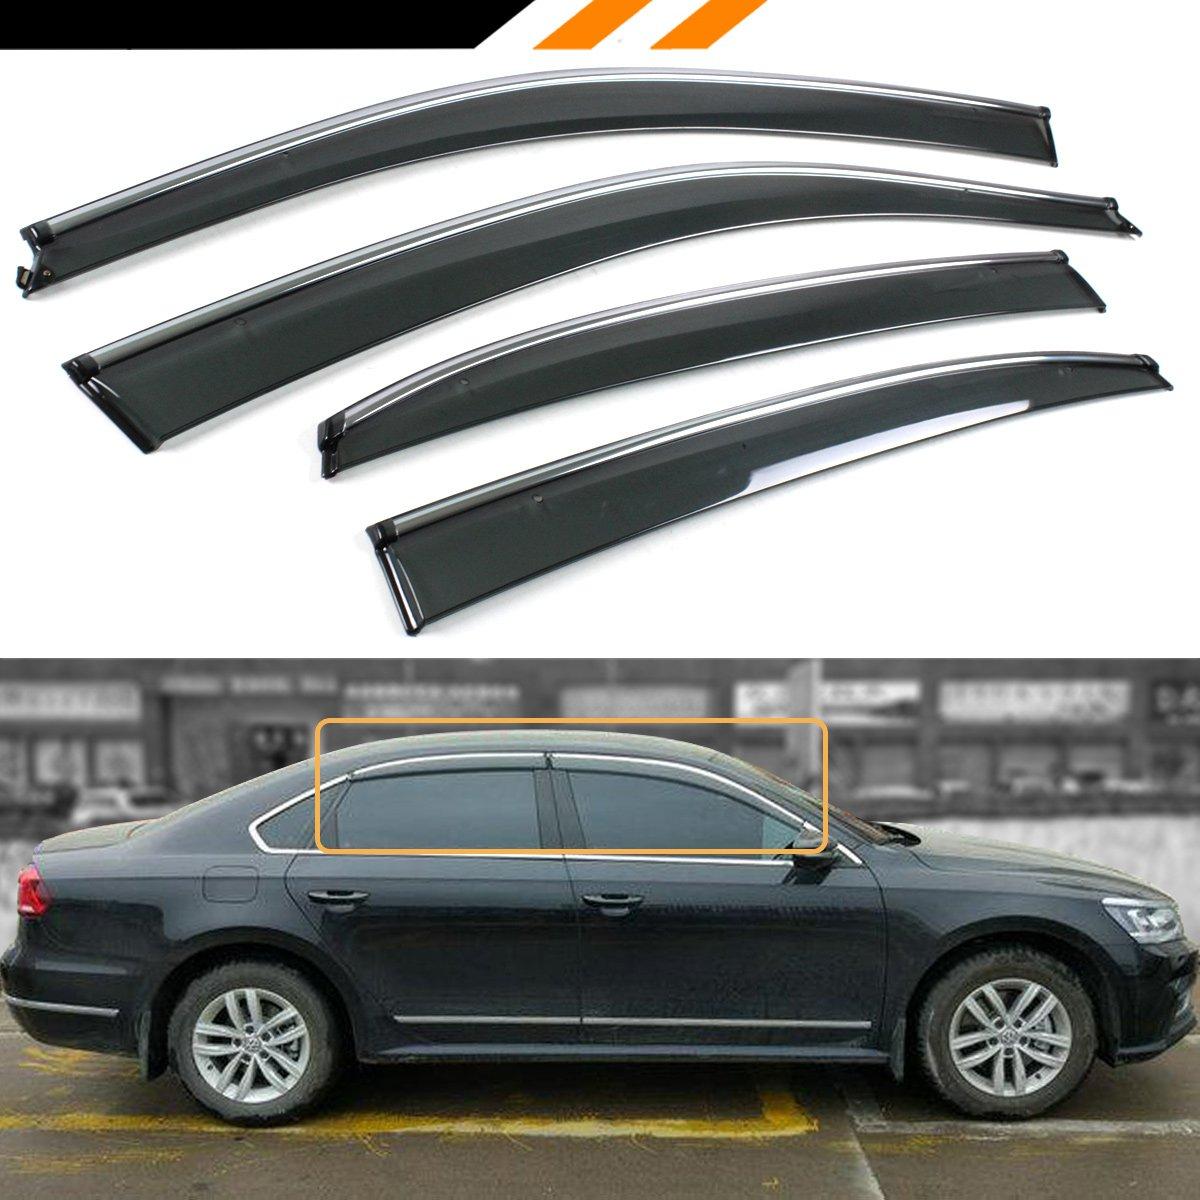 Cuztom Tuning Smoke Tinted Clip ON Window Visor RAIN Guard W/Chrome Trim for 2011-2018 VW Passat